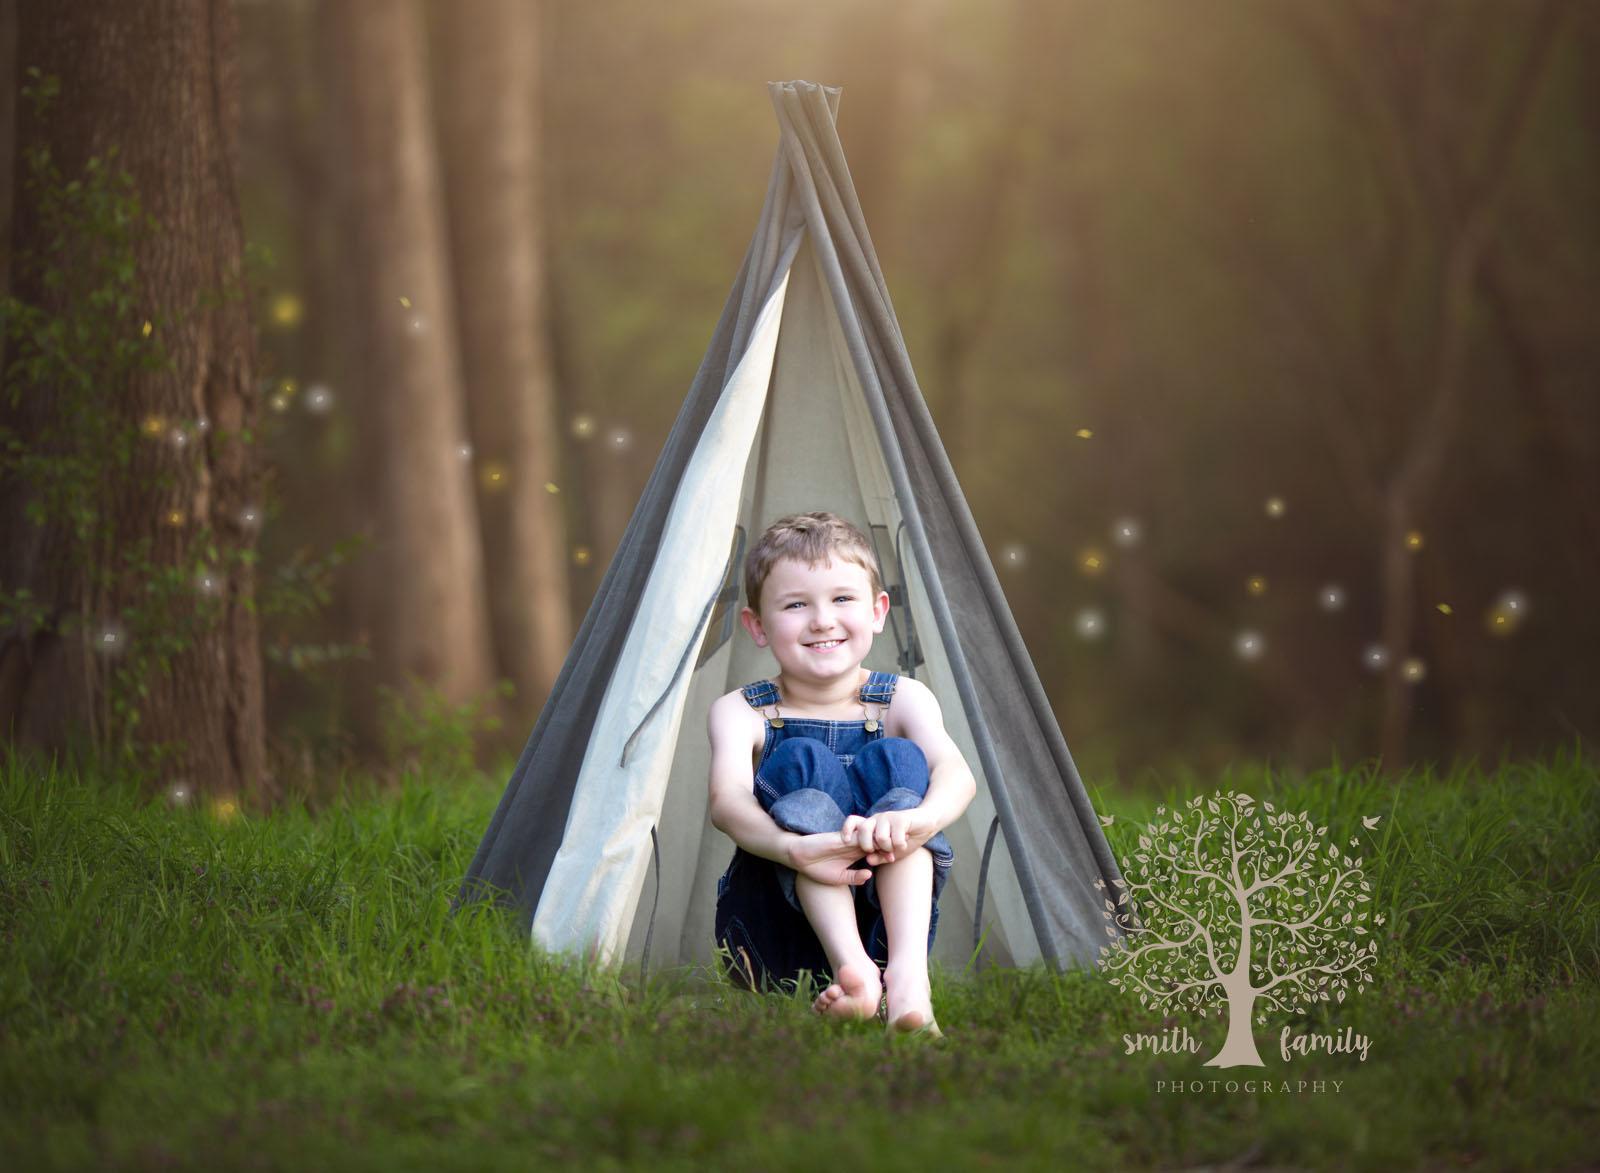 huckleberry_finn_tent_camping_smith_family_photography_waco